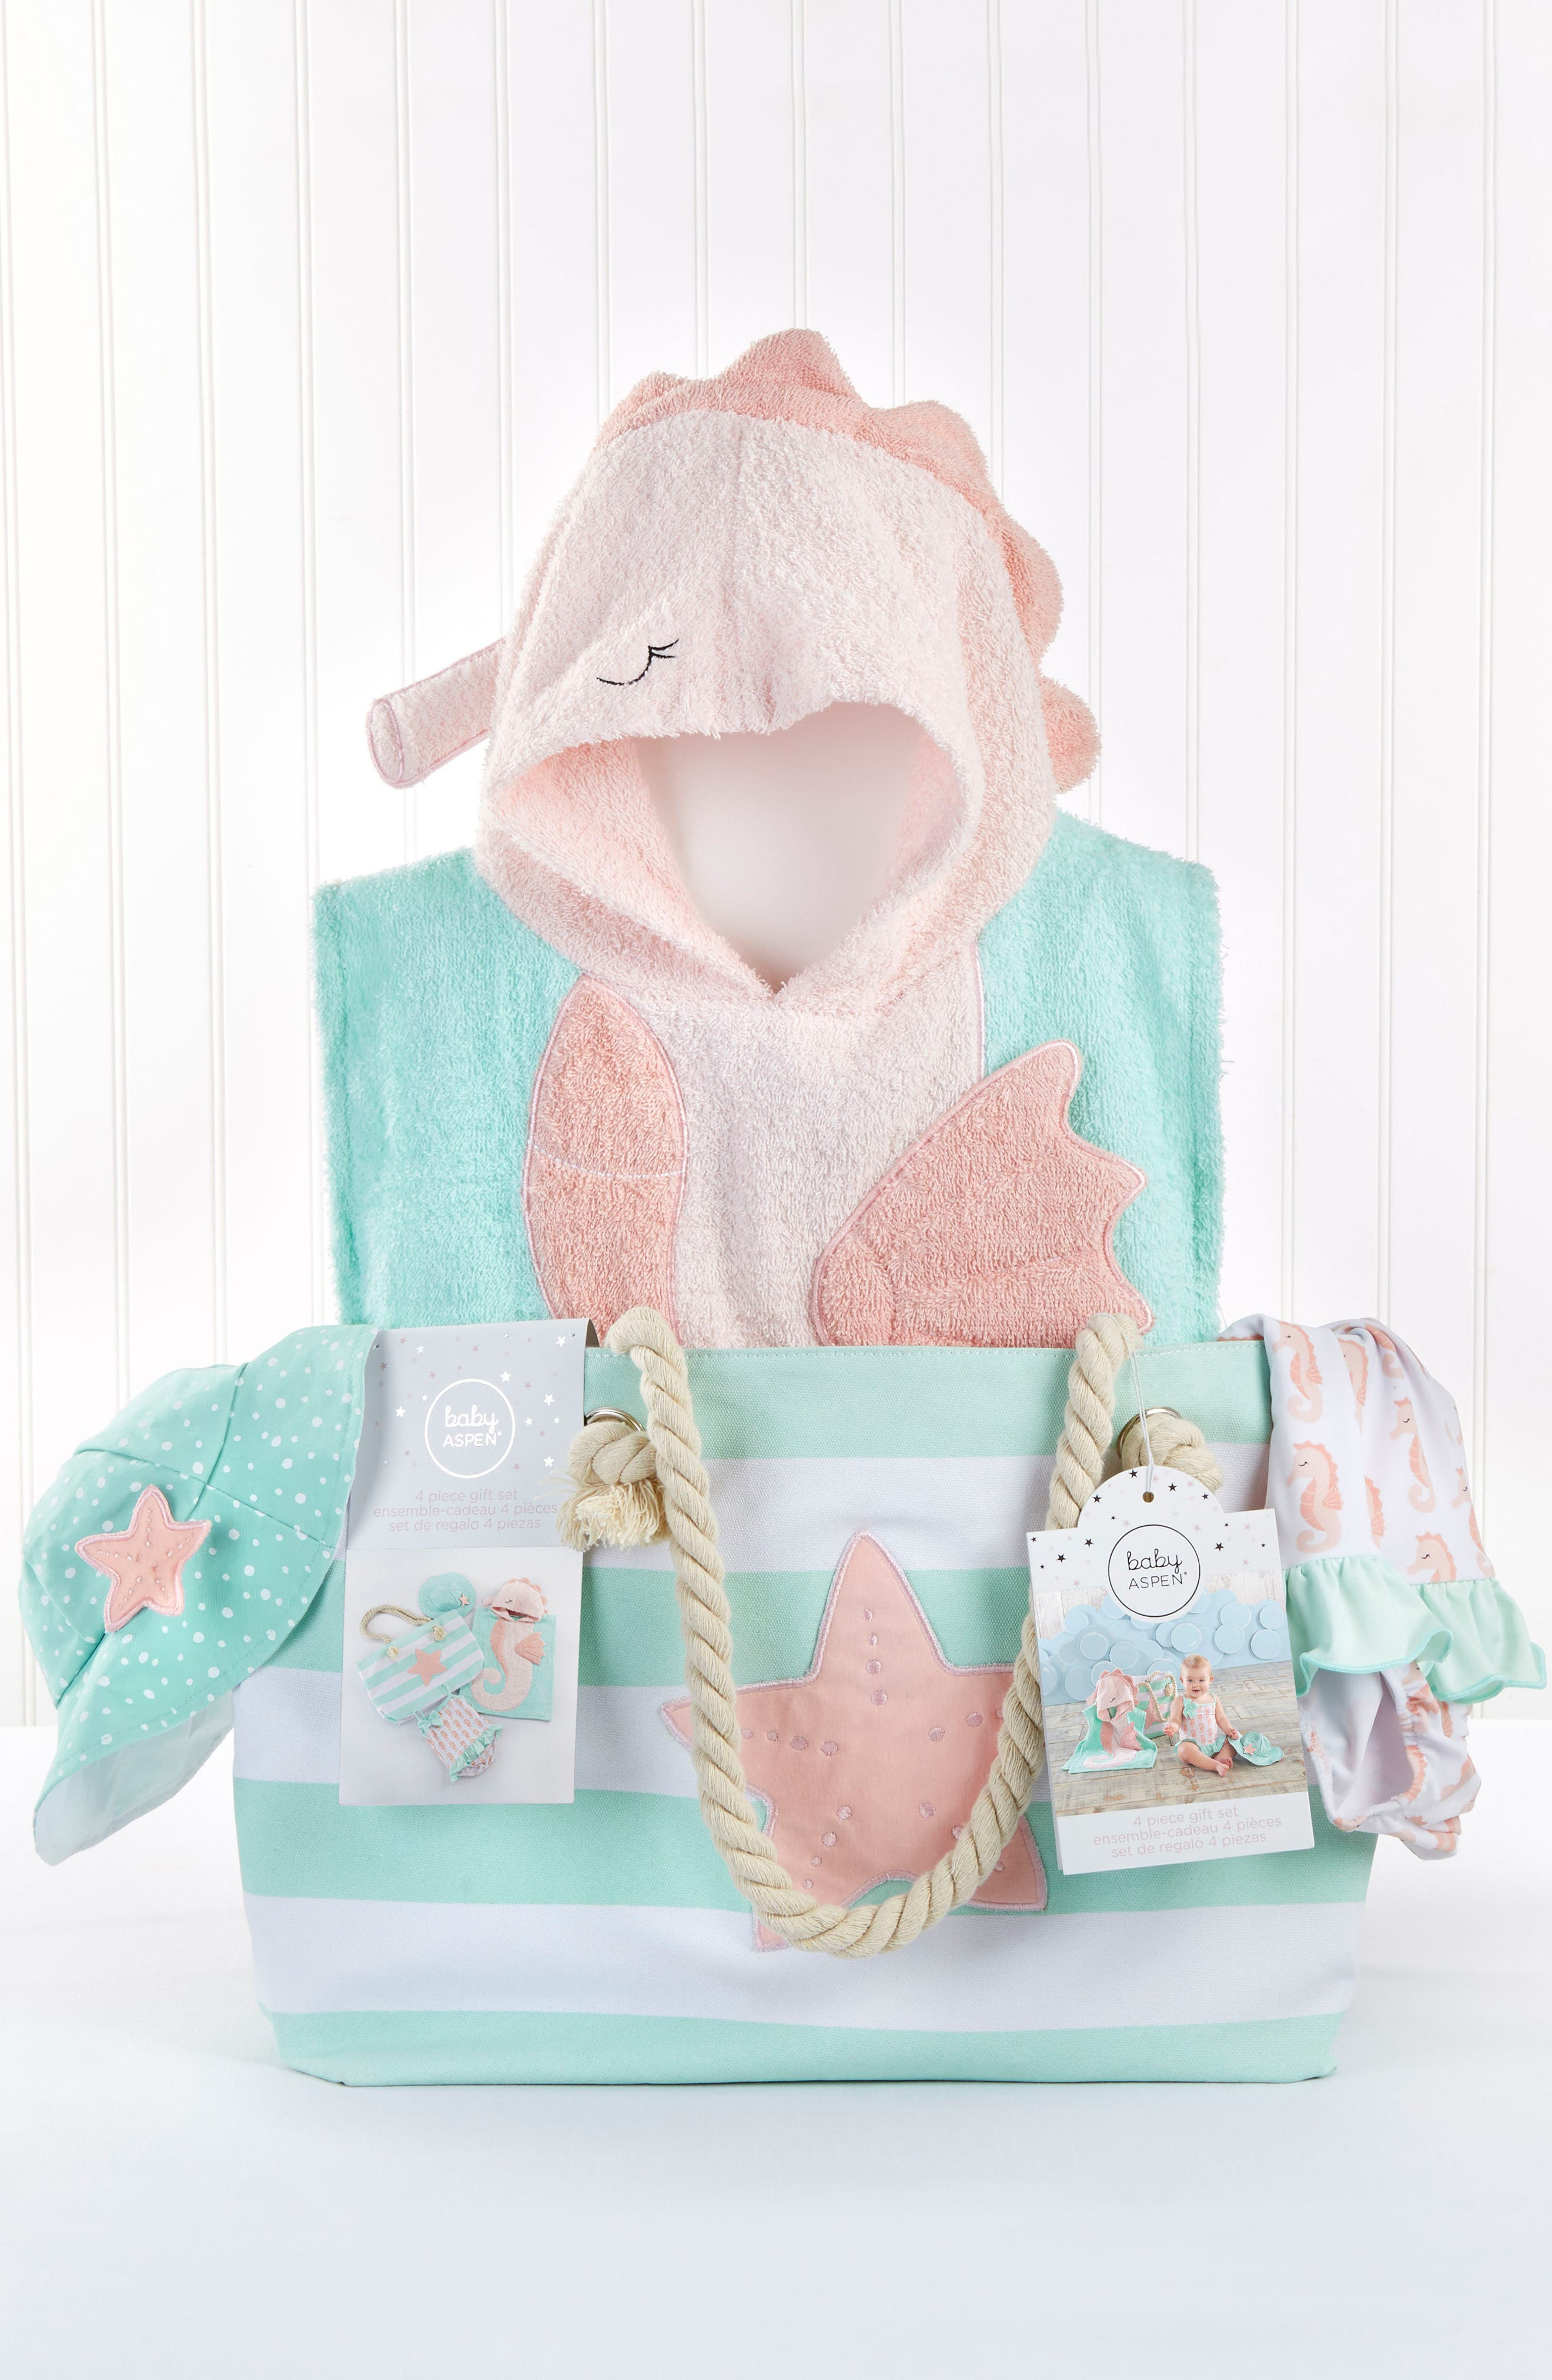 BABY ASPEN, Seahorse Hooded Towel, Swimsuit, Sun Hat & Tote Set, Alternate thumbnail 2, color, 690